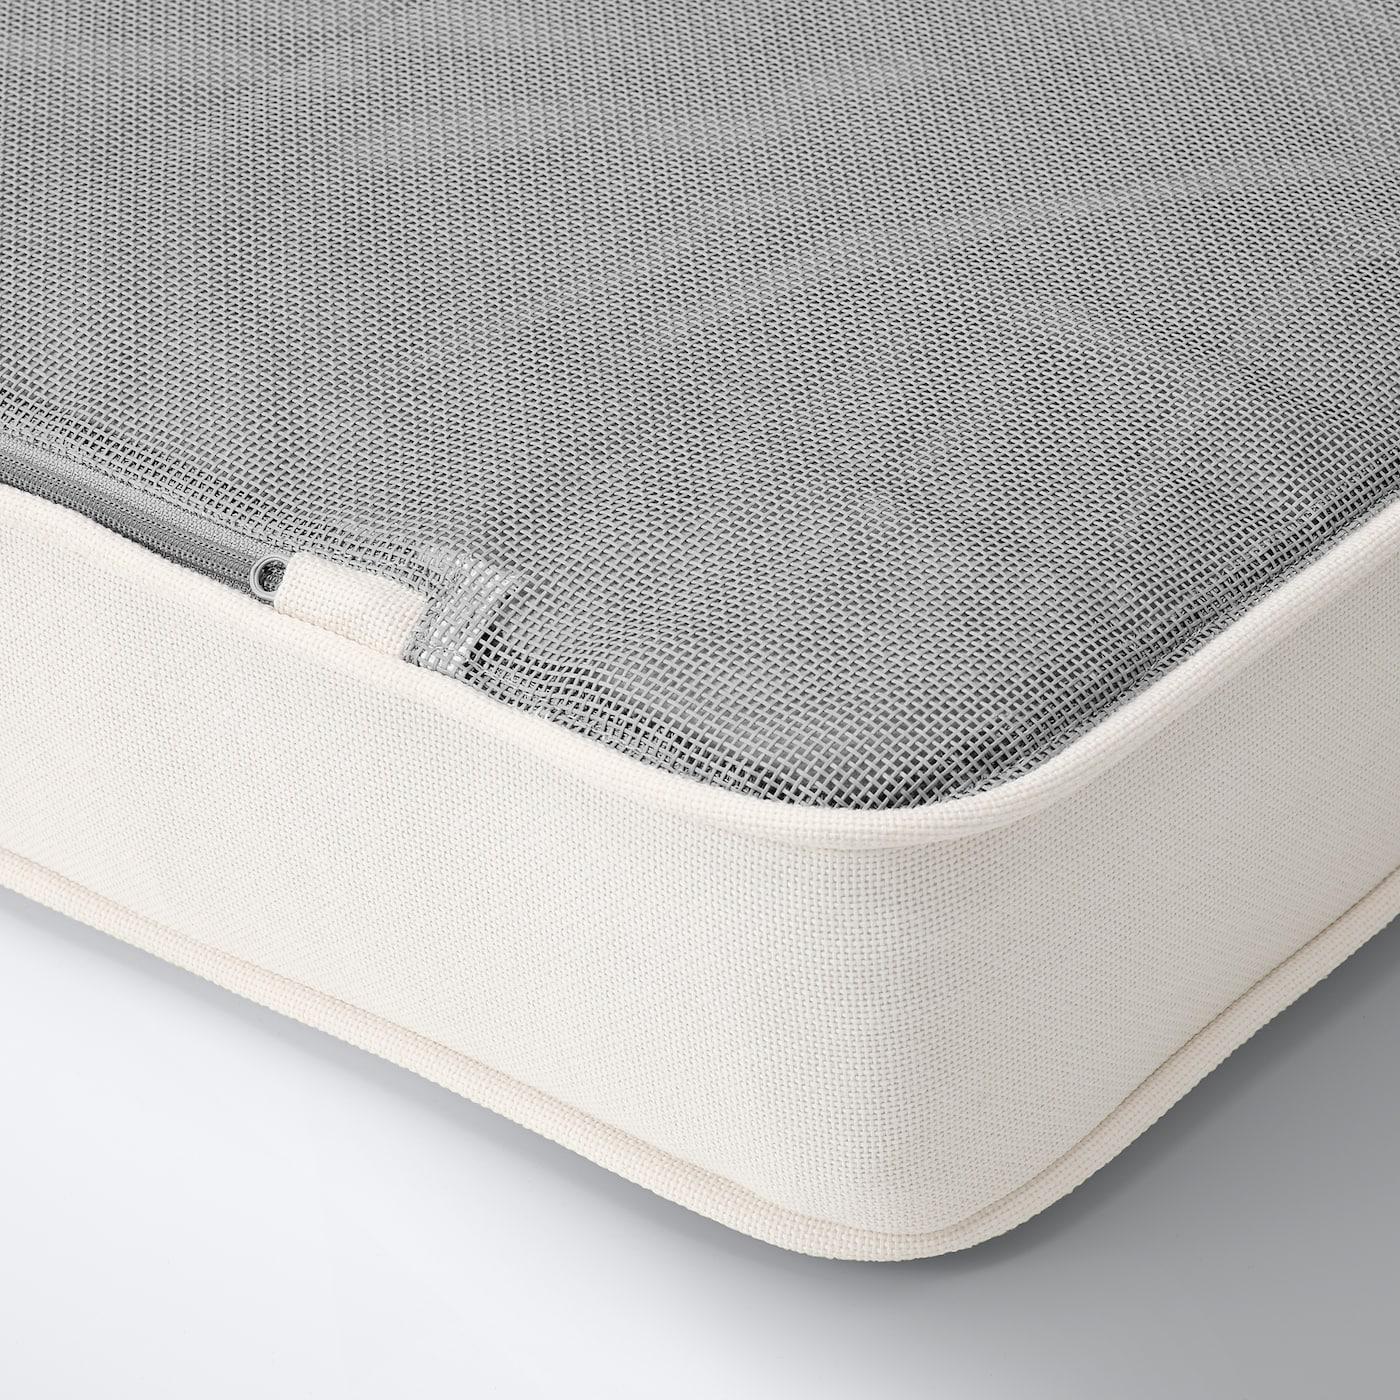 BONDHOLMEN 4-seat conversation set, outdoor, gray stained/Järpön/Duvholmen white